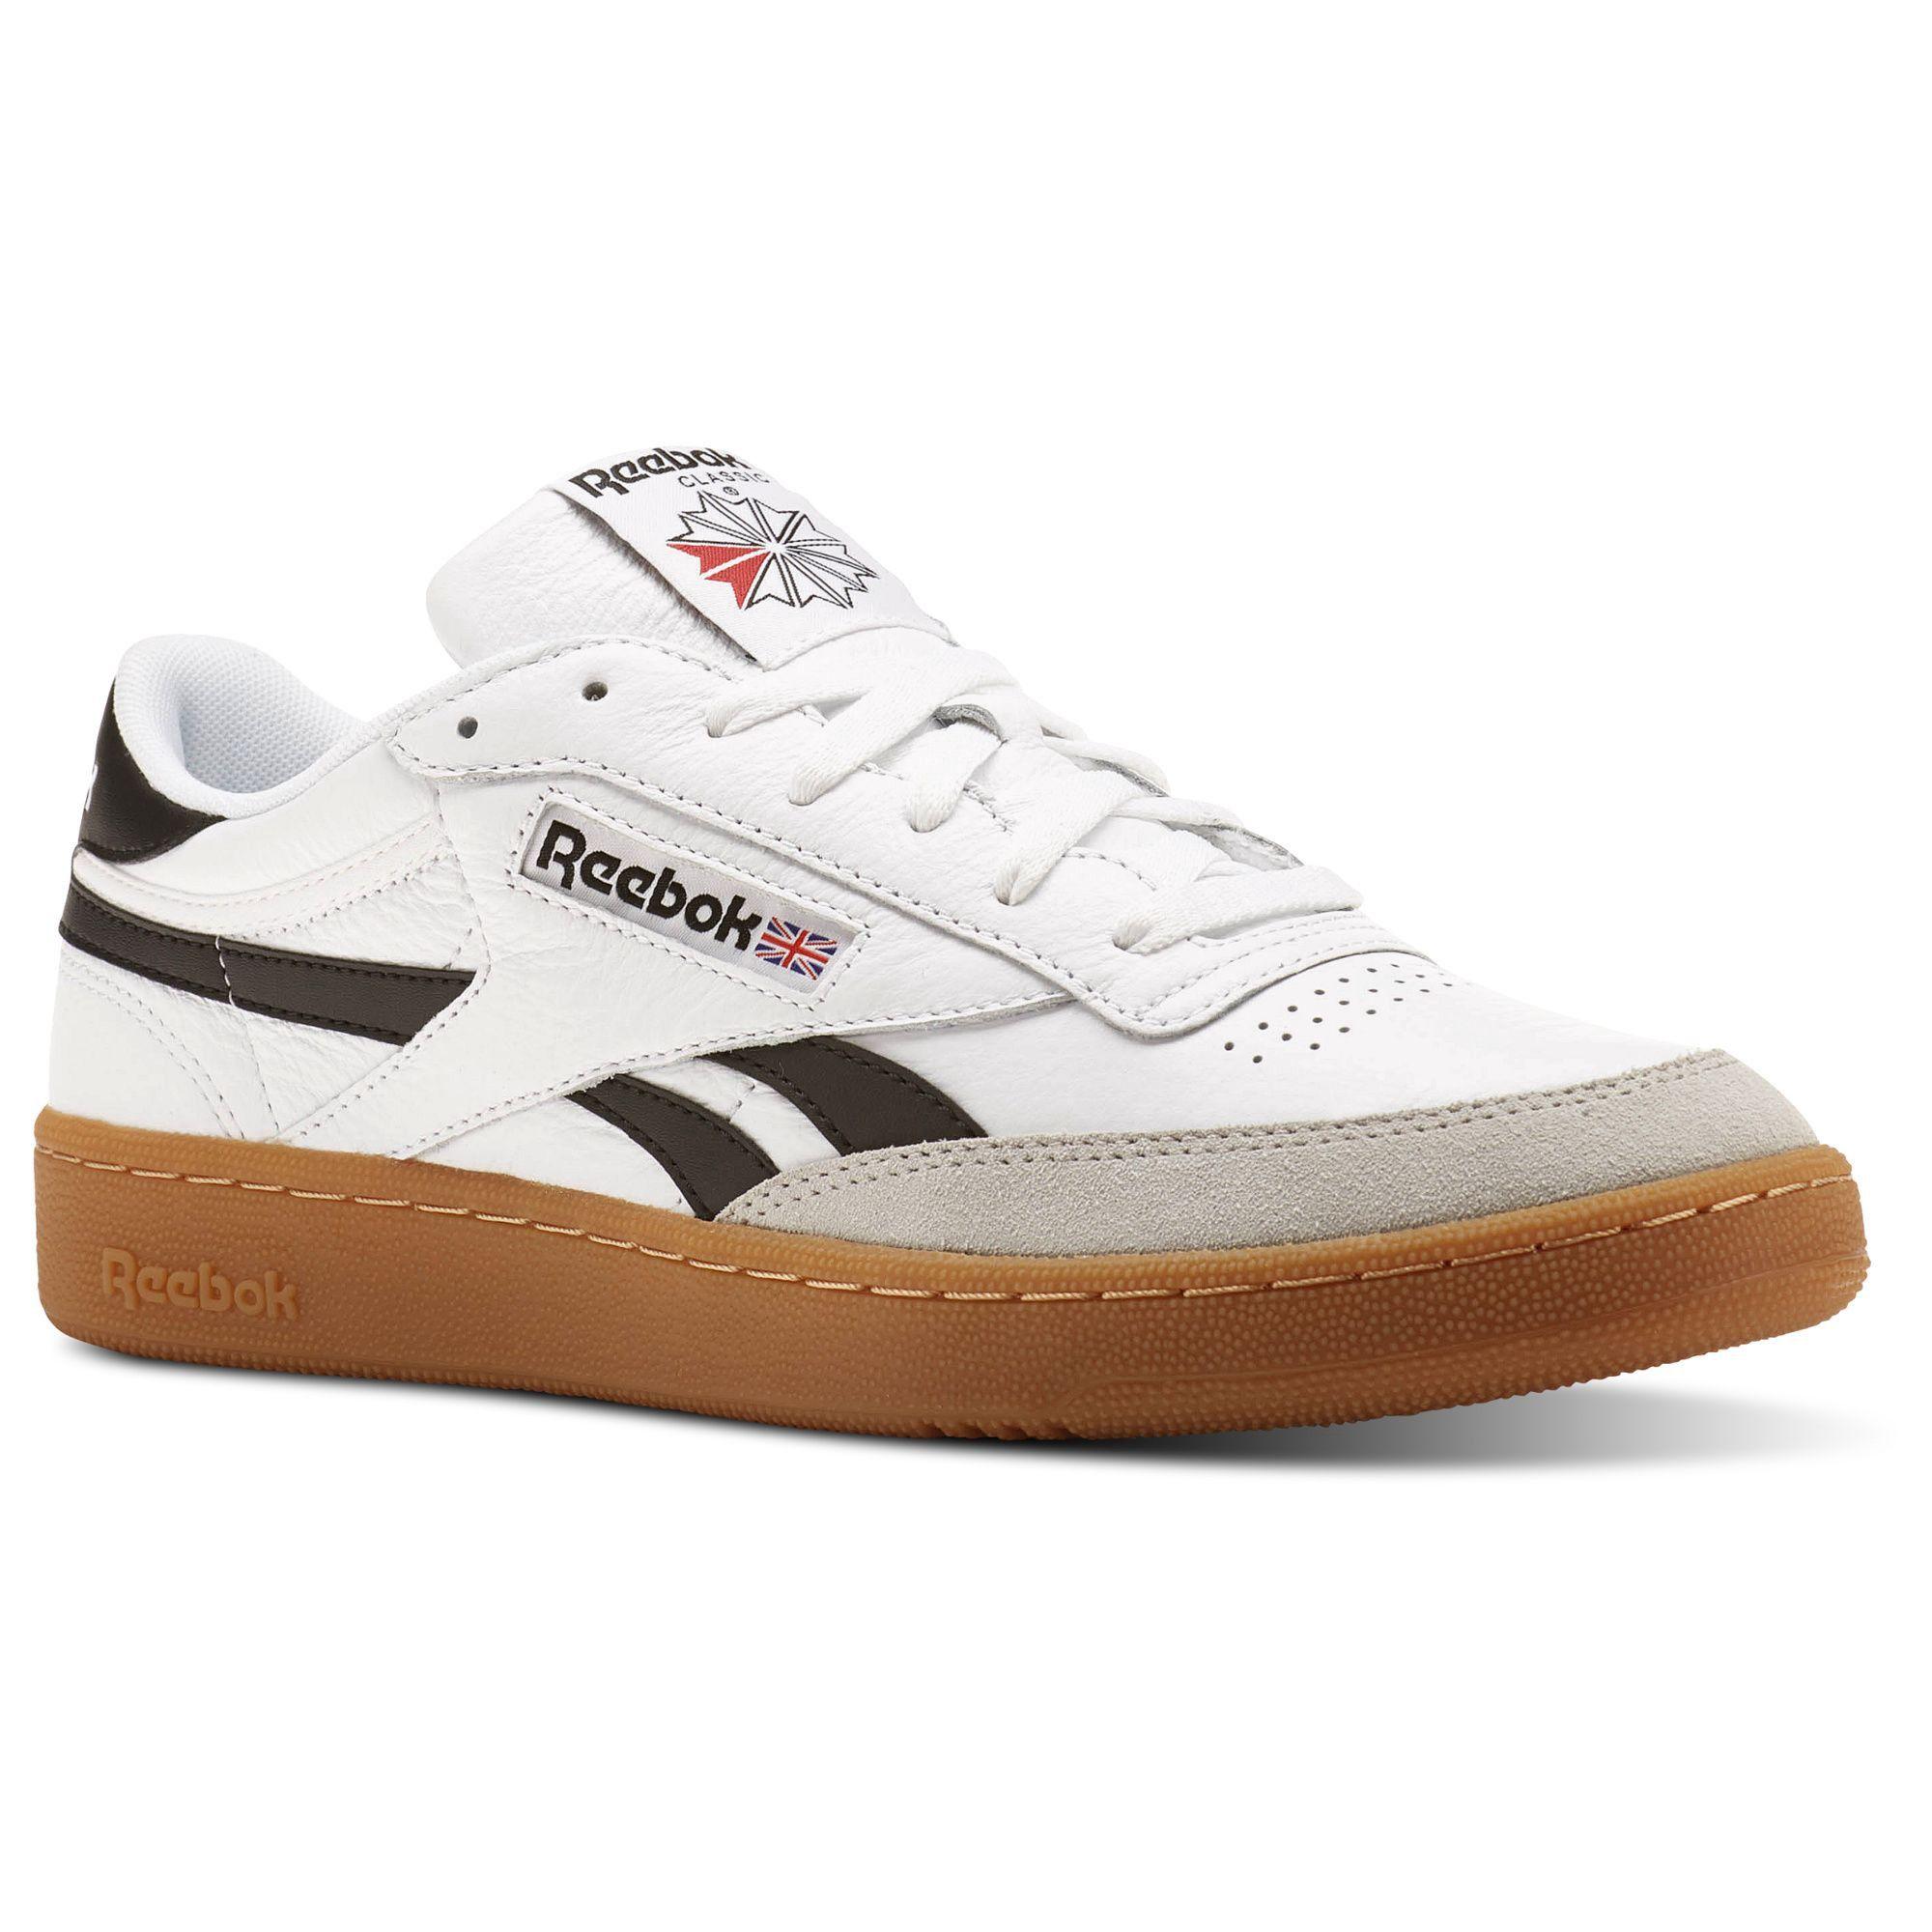 Reebok Classics Revenge Plus Gum Pack | SneakerFiles